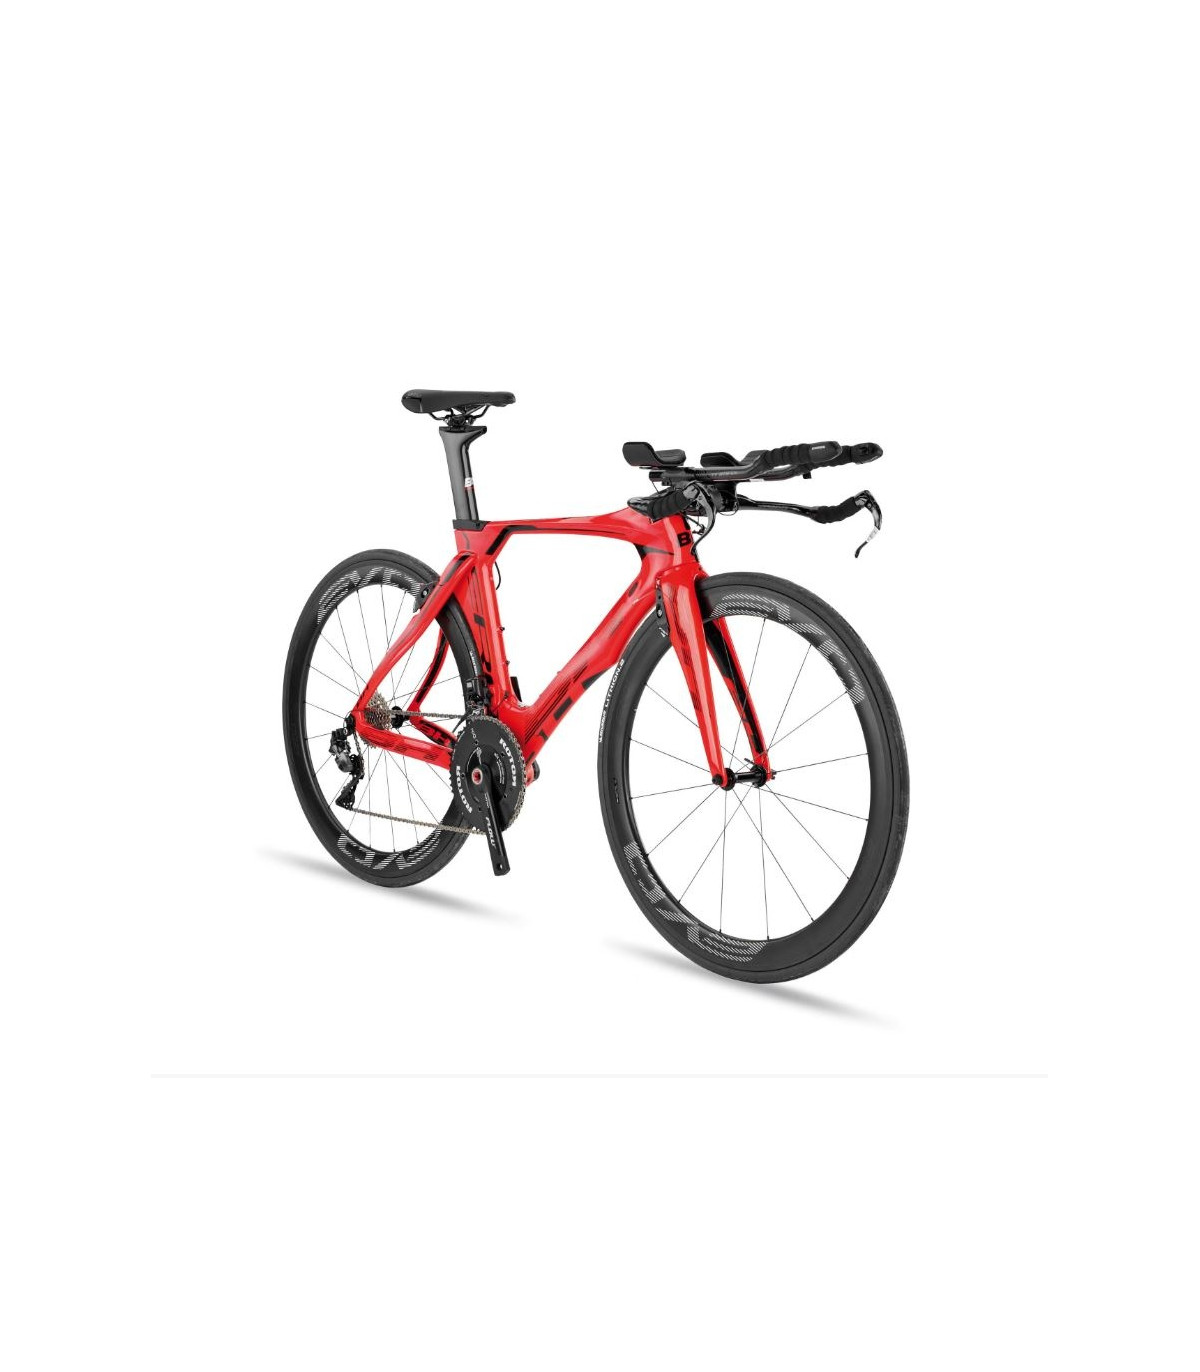 Kit Cadre vélo BH AEROLIGHT 2019|Feelbikes